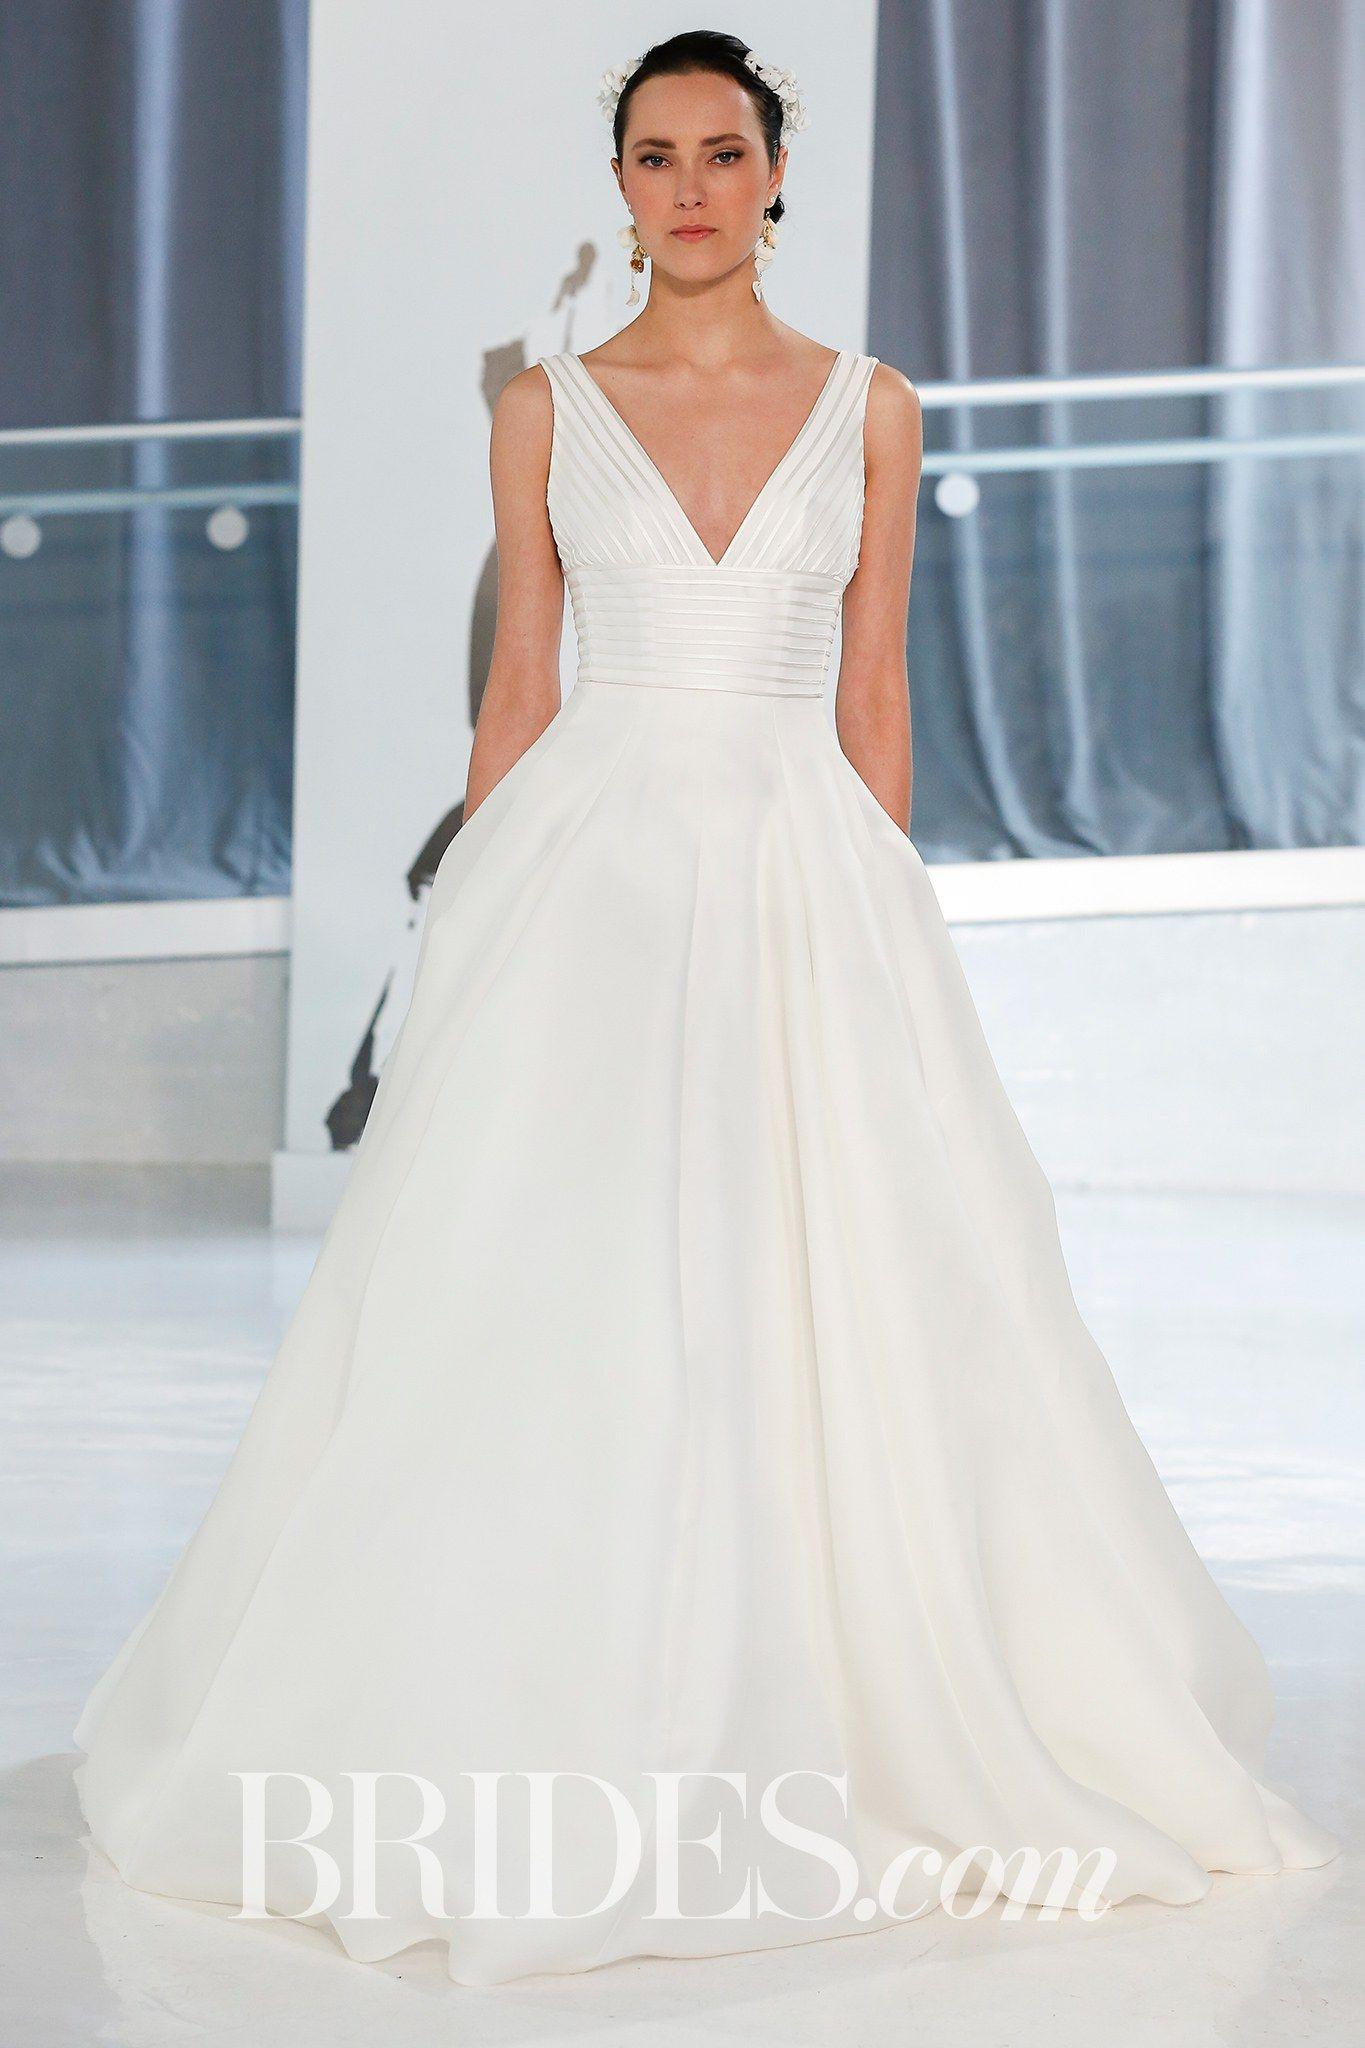 1920s Style Wedding Dress | Pinterest | Wedding dress, Silk organza ...